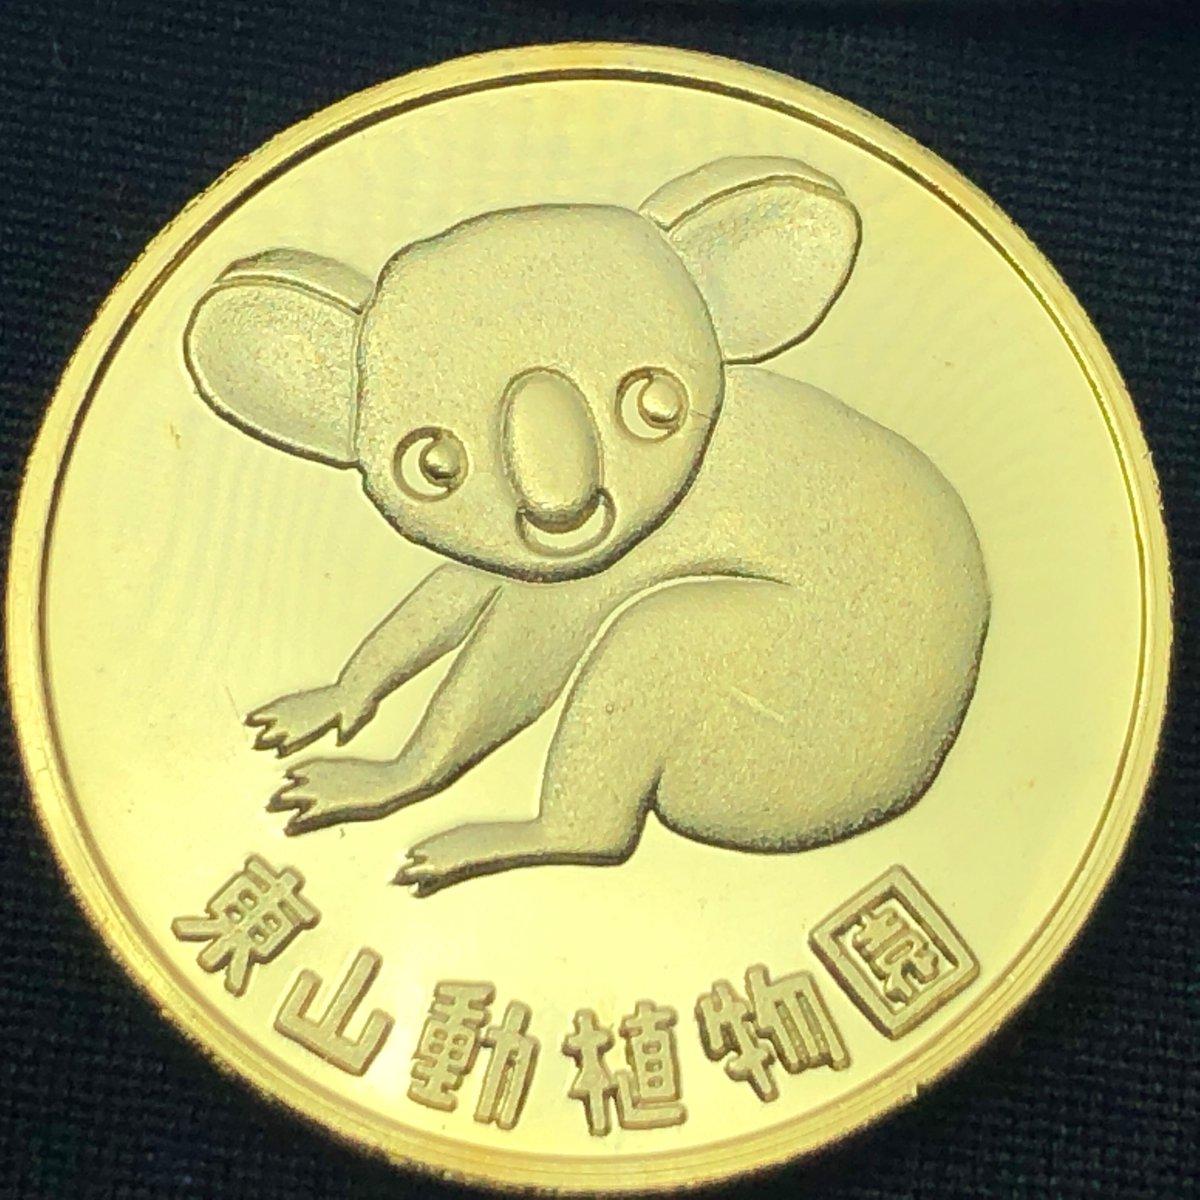 test ツイッターメディア - 東山動植物園の記念メダル(コアラ)。 https://t.co/ybgO3rp0u9